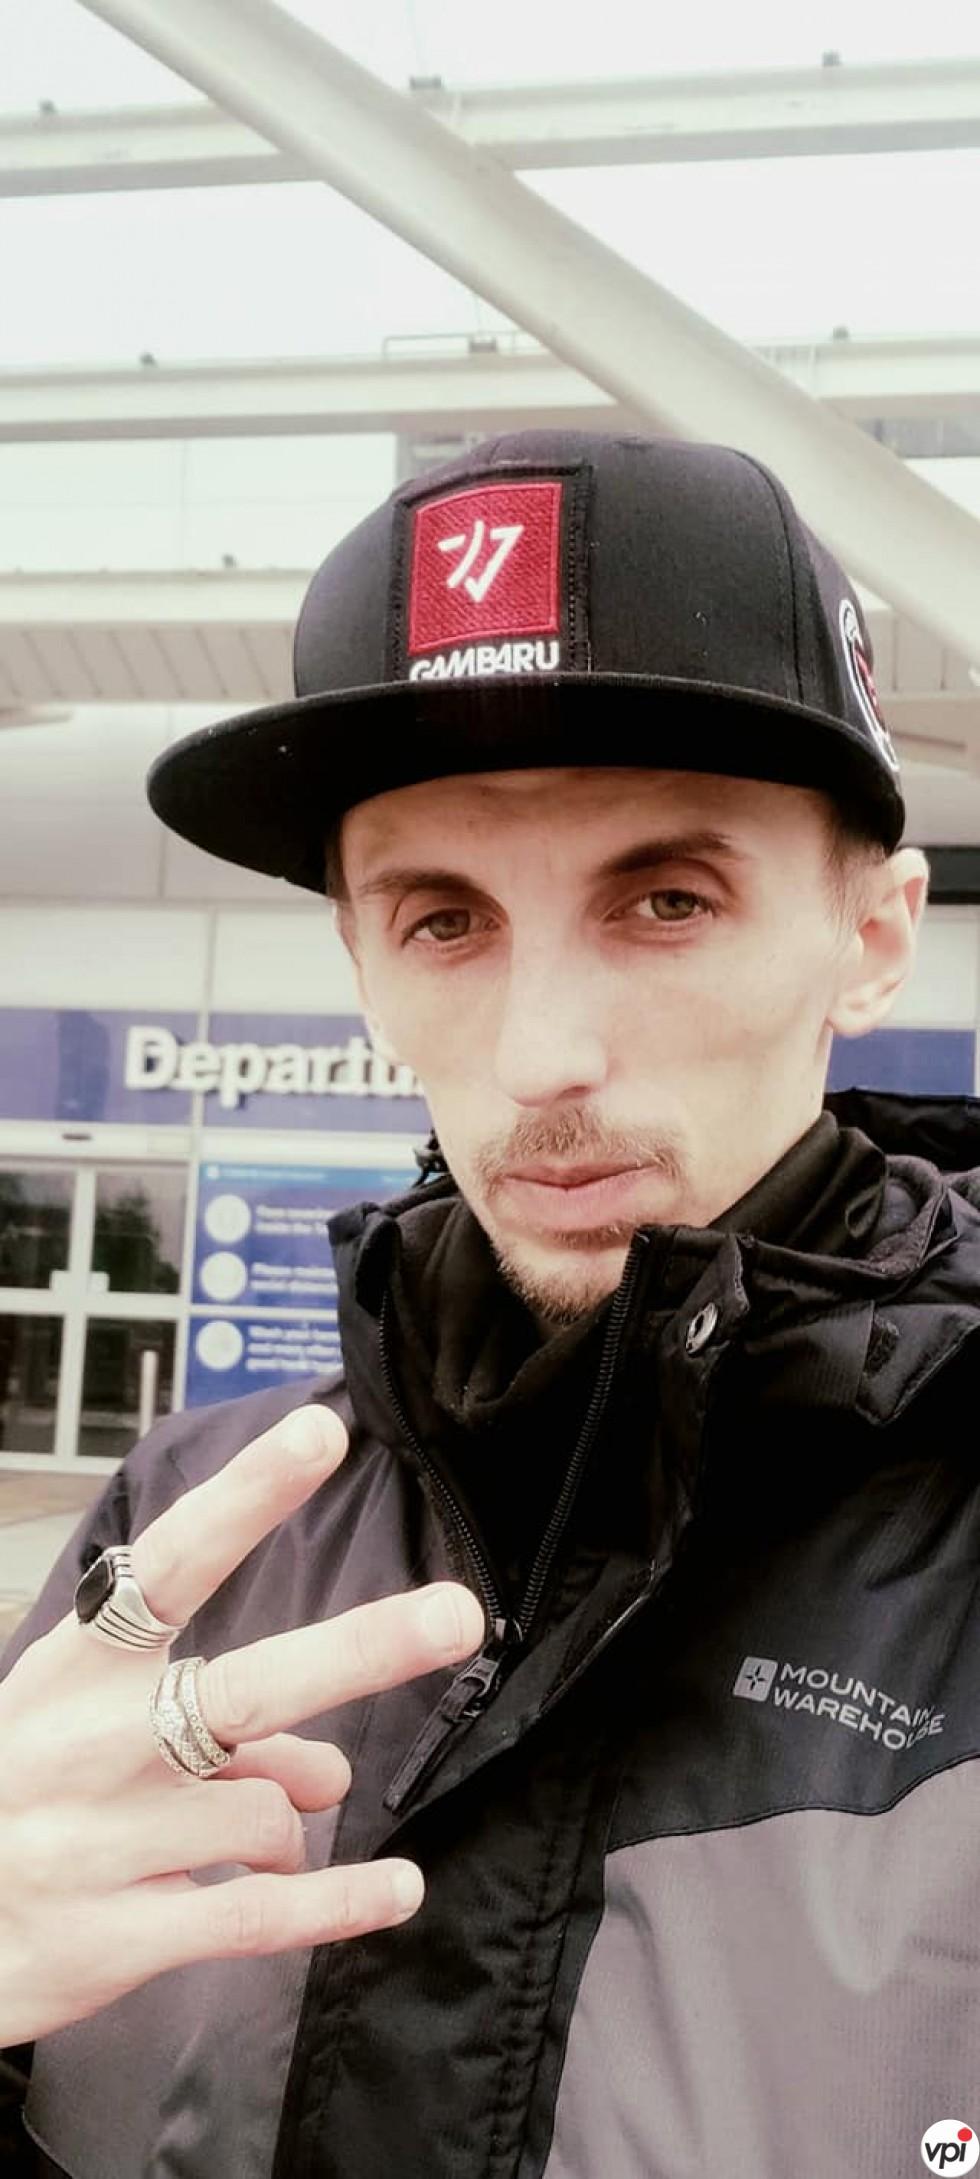 DASQ (DJ & Producer) in Birmingham Airport 5 Feb 2021